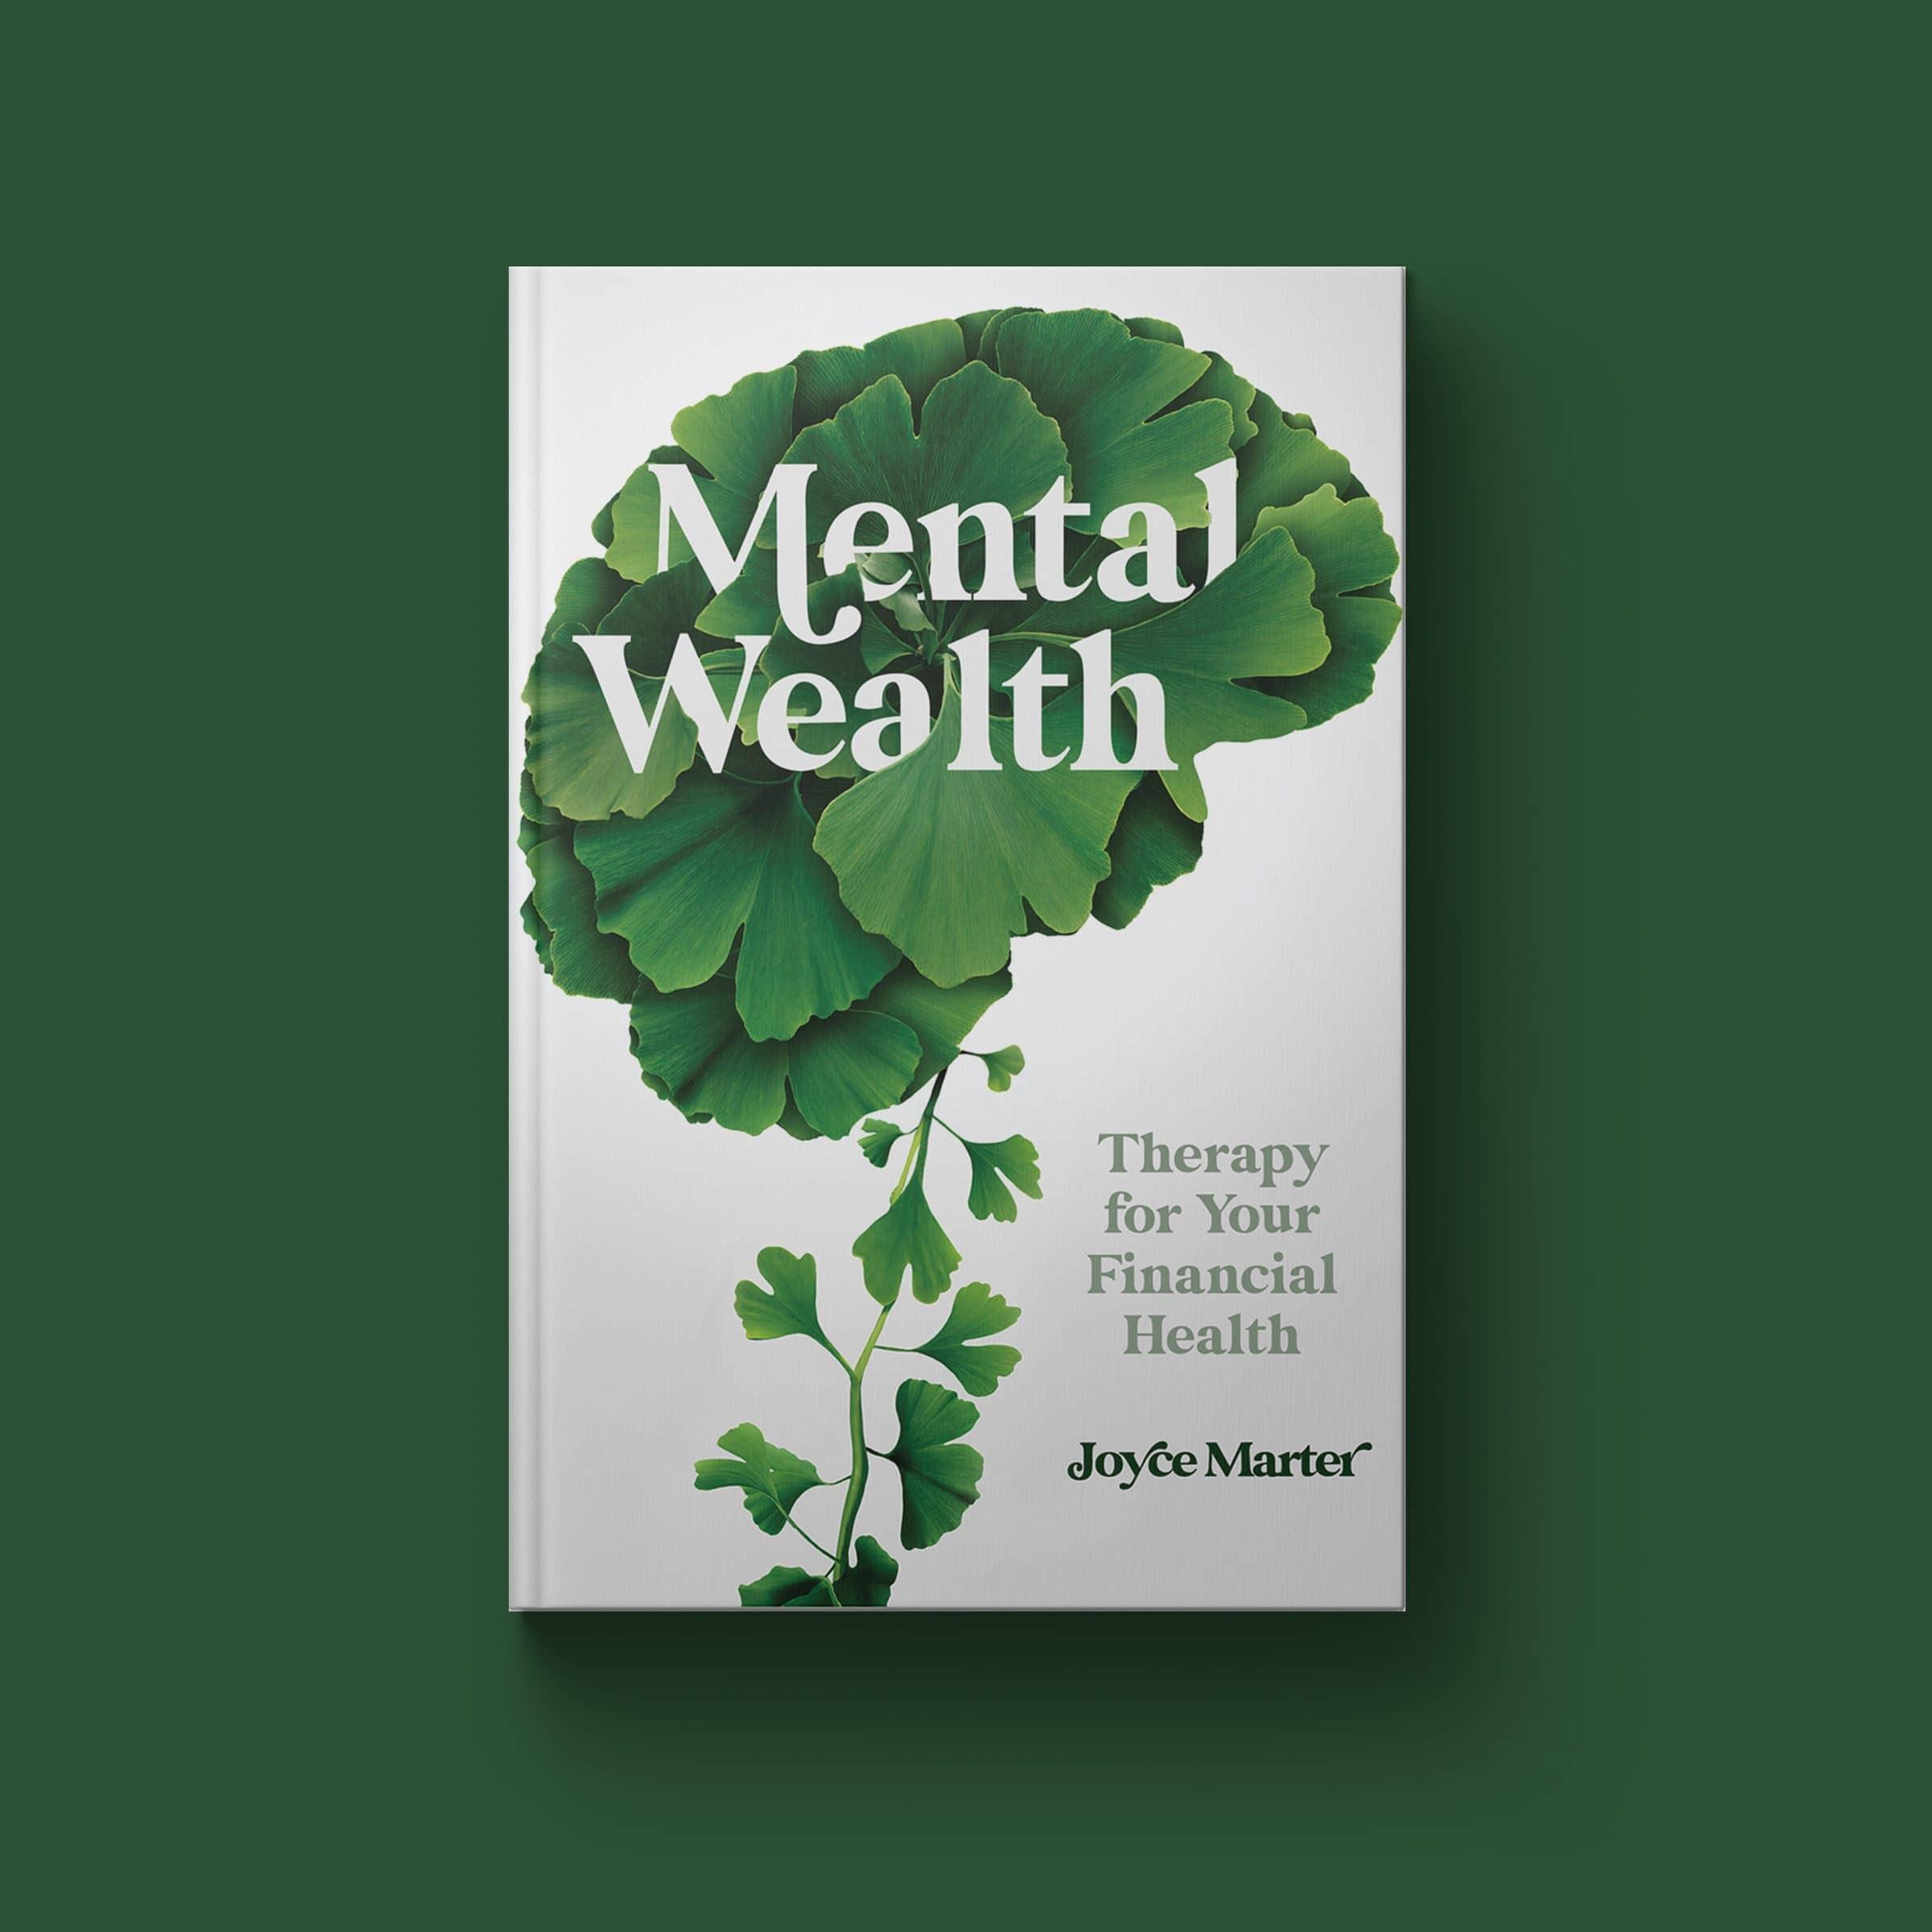 mental-wealth-joyce-marter-cover-art-10